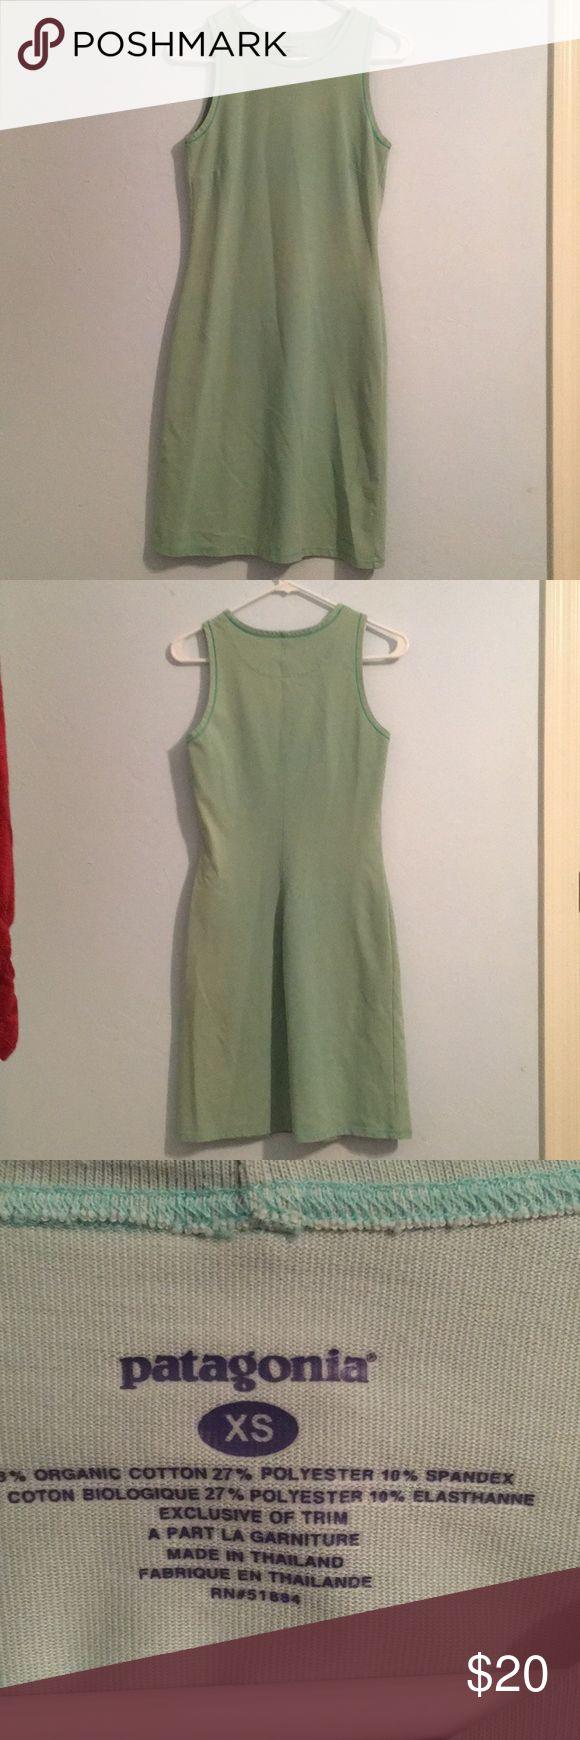 "Patagonia dress Mint green Patagonia dress, stretchy/comfortable material, bandage style dress, 36"" long Patagonia Dresses"